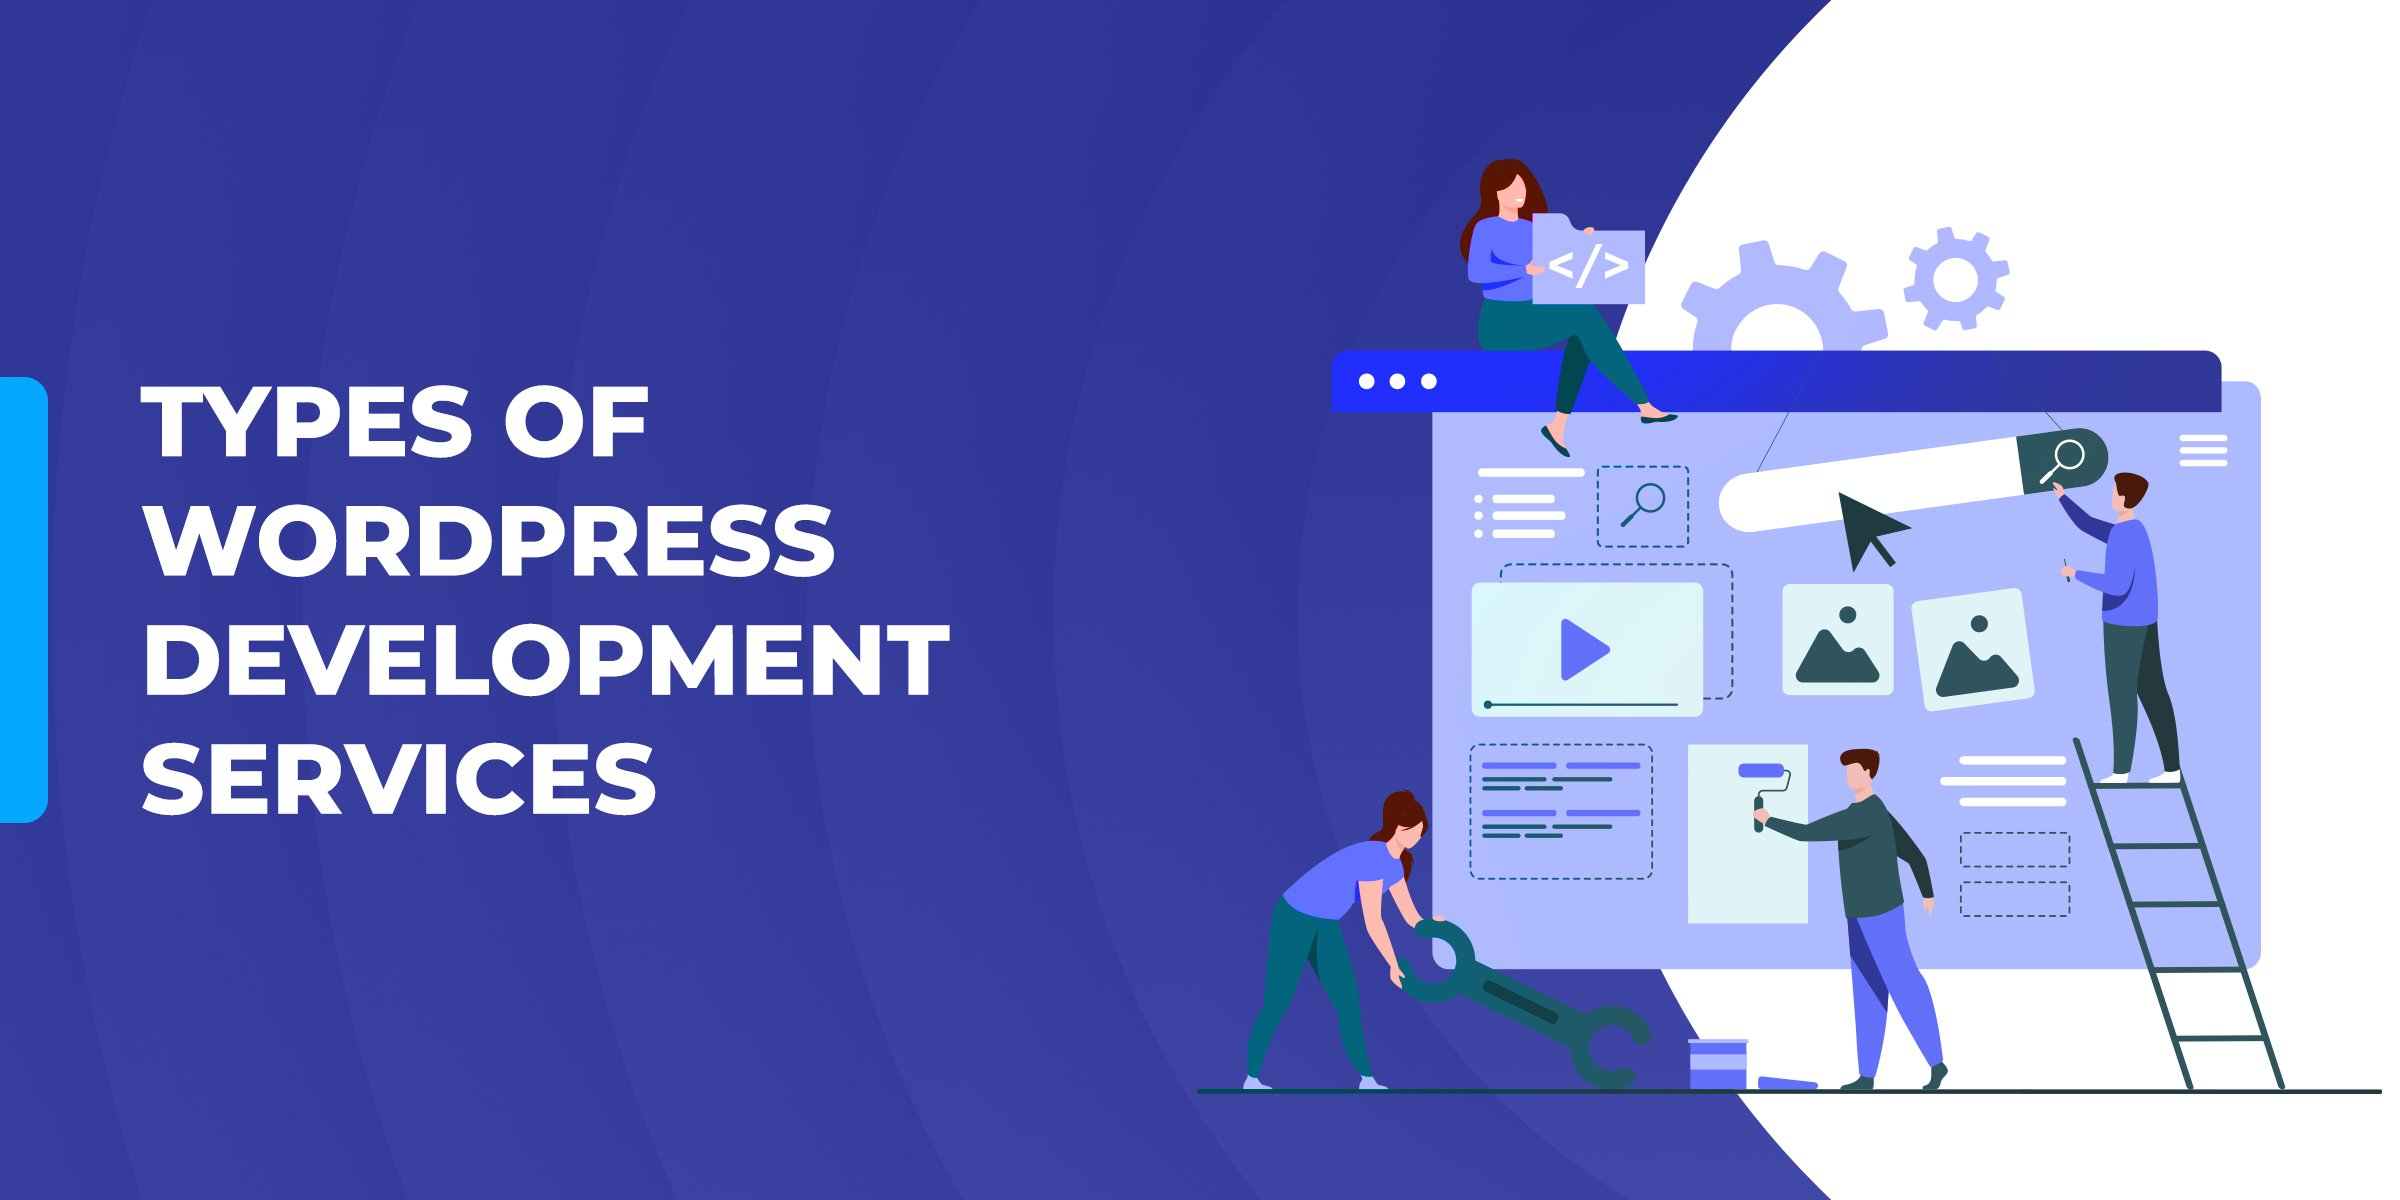 Types of WordPress Development Services